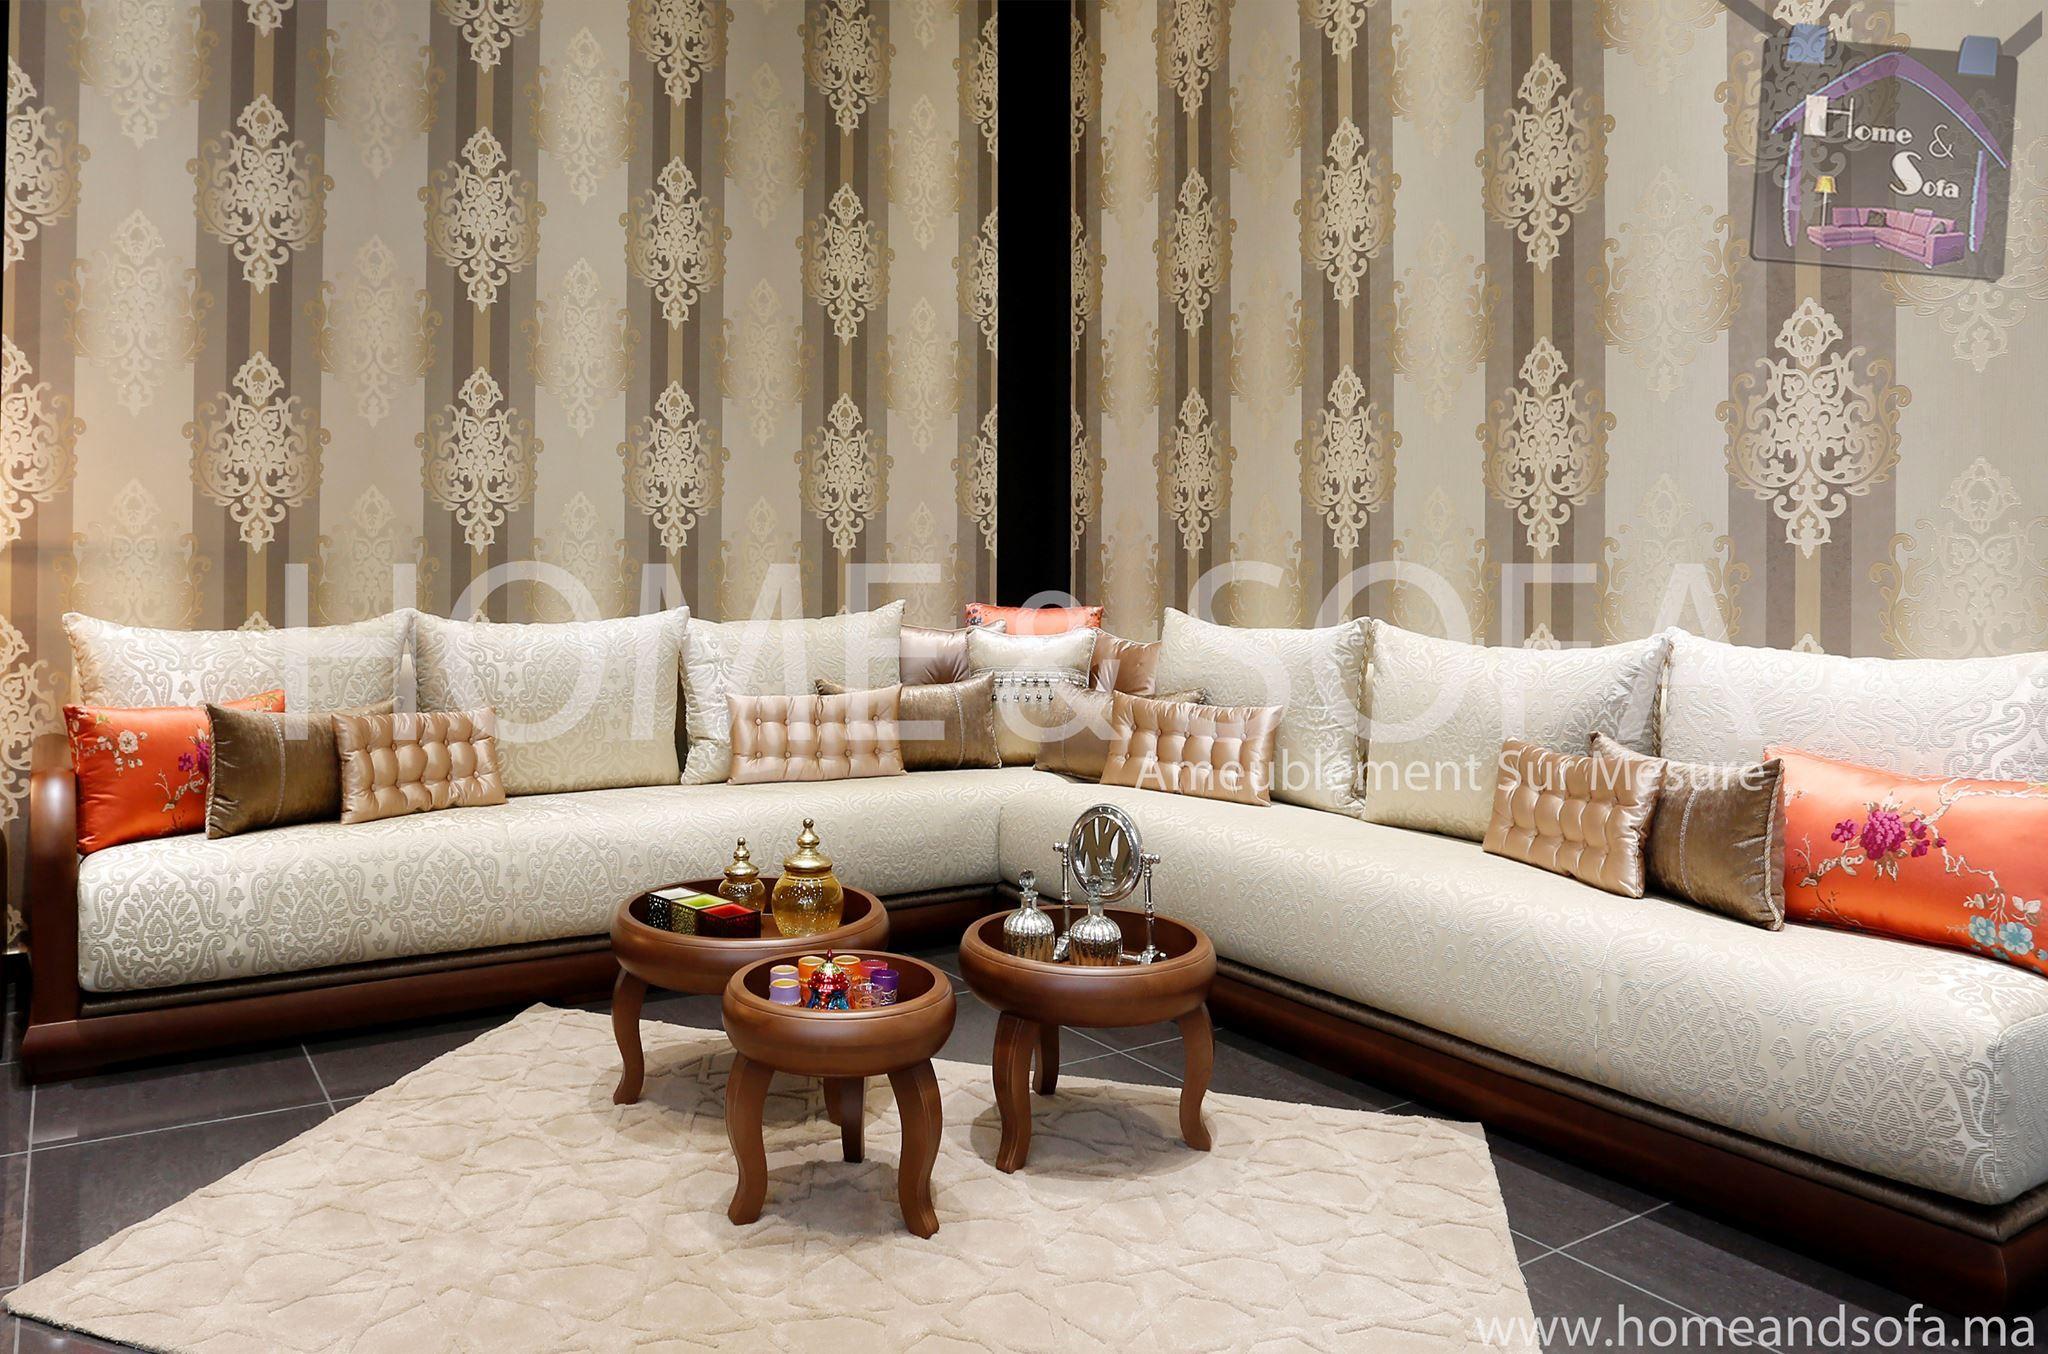 Salons Decor Interior Ideas Interior Design Salon Design Furniture Design Living Rooms Homes Moroccan Room Modern Moroccan & Pin by Ghat Imane on Salon | Pinterest | Salons Salon design and ...